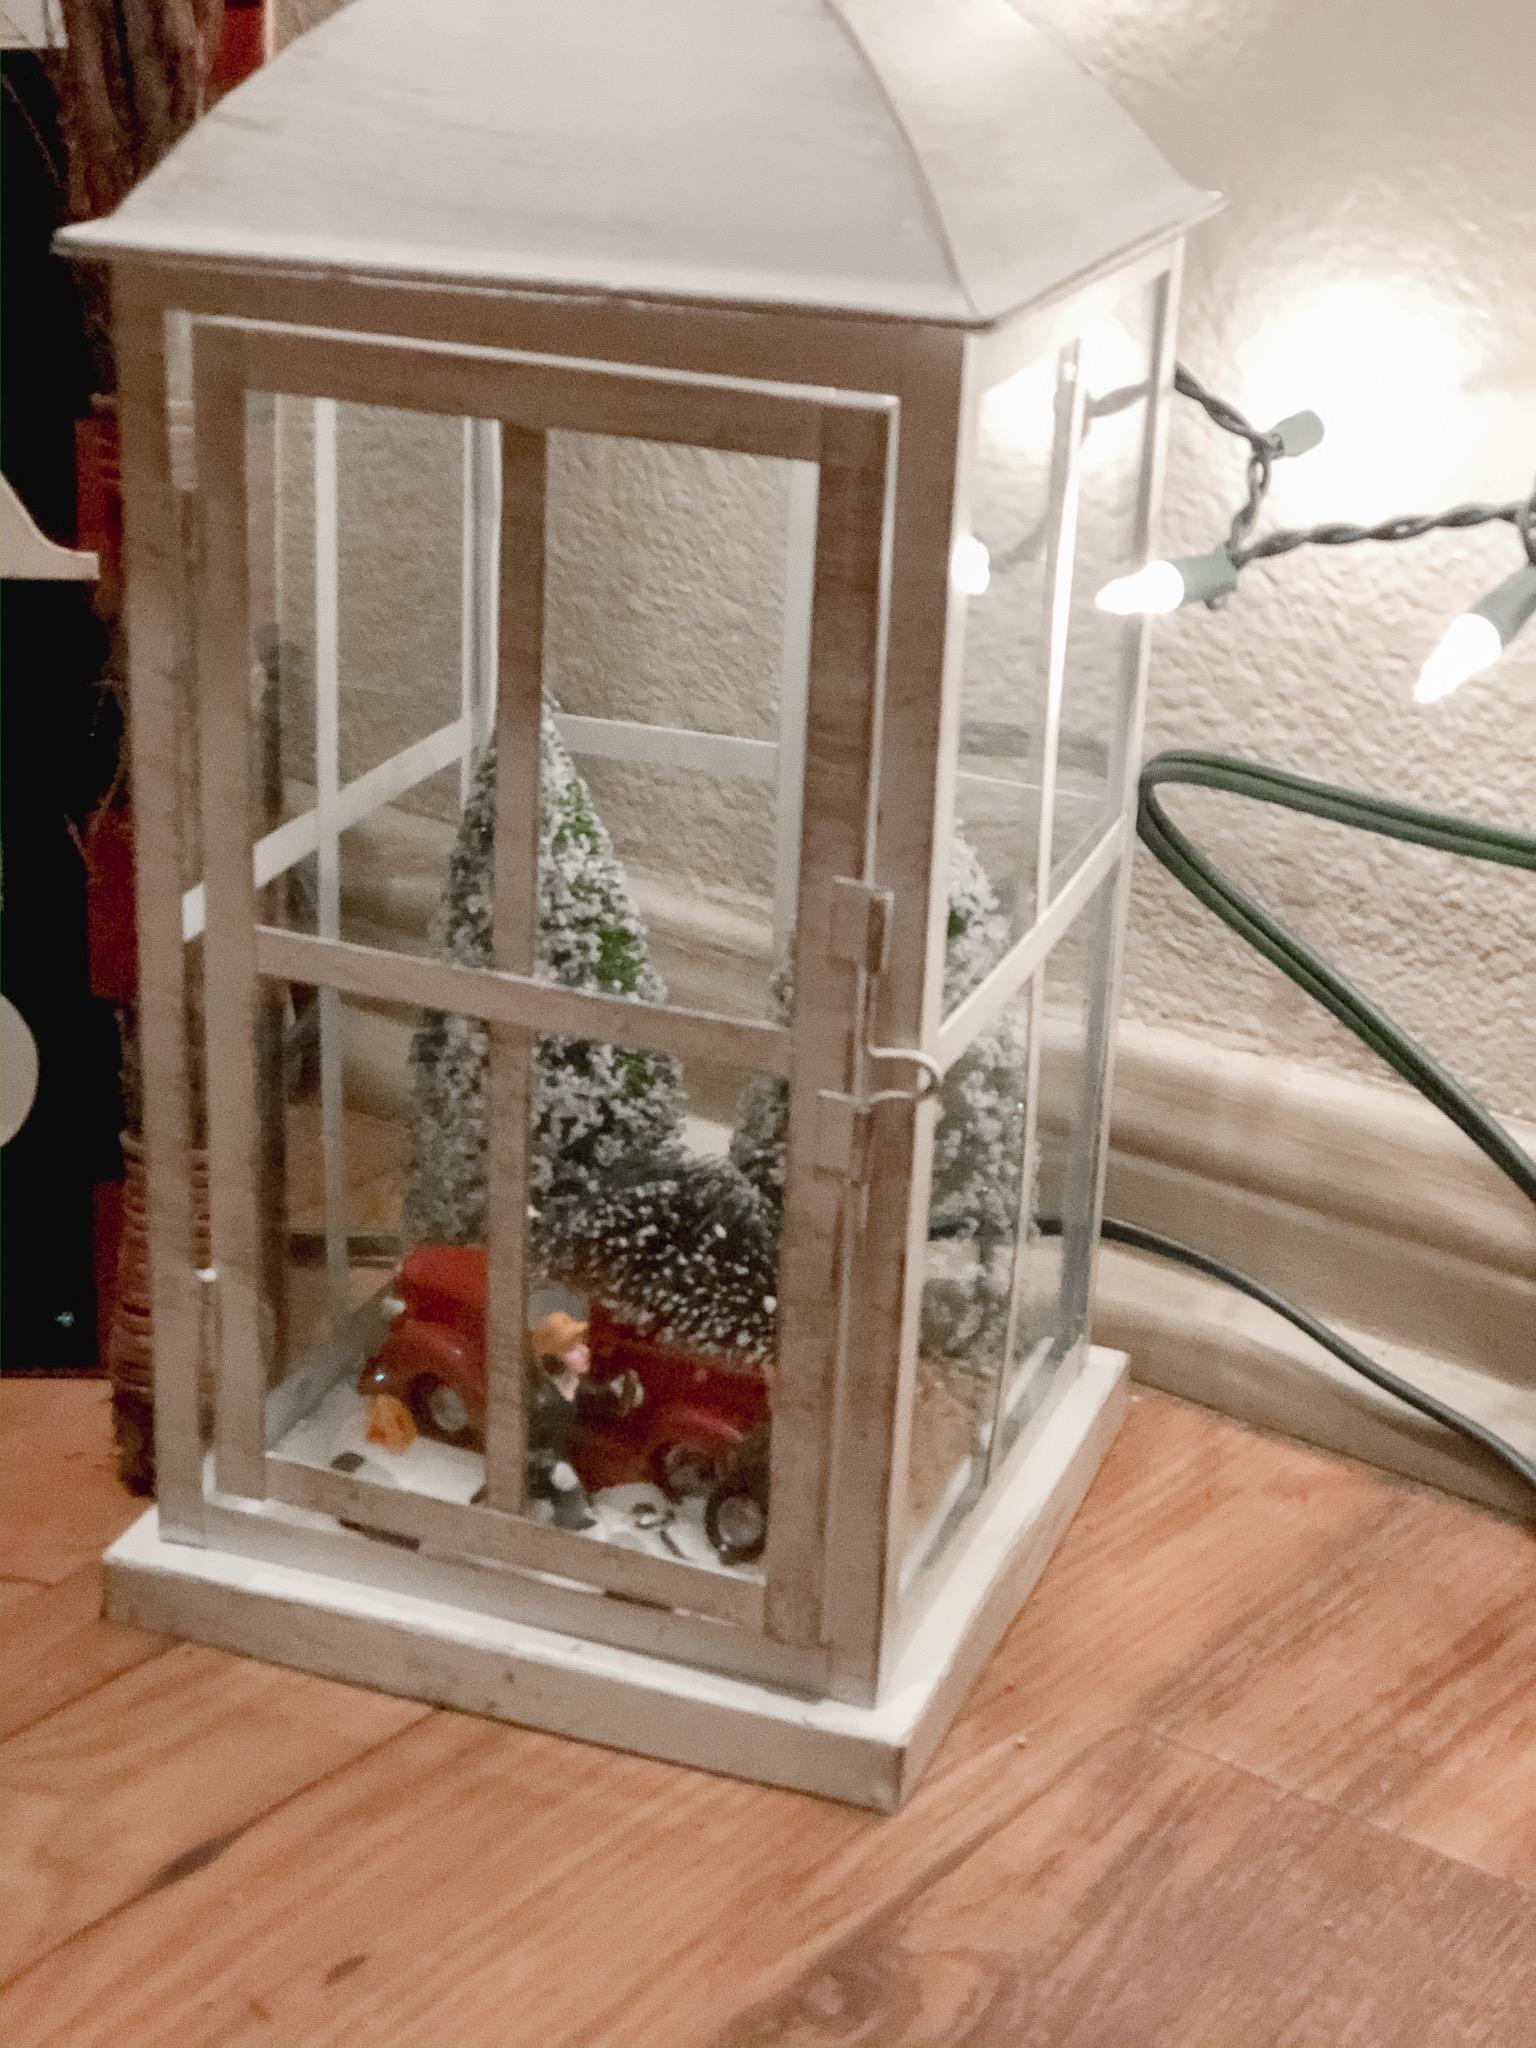 My Home Decor This Holiday Season   Chaos and Coffee